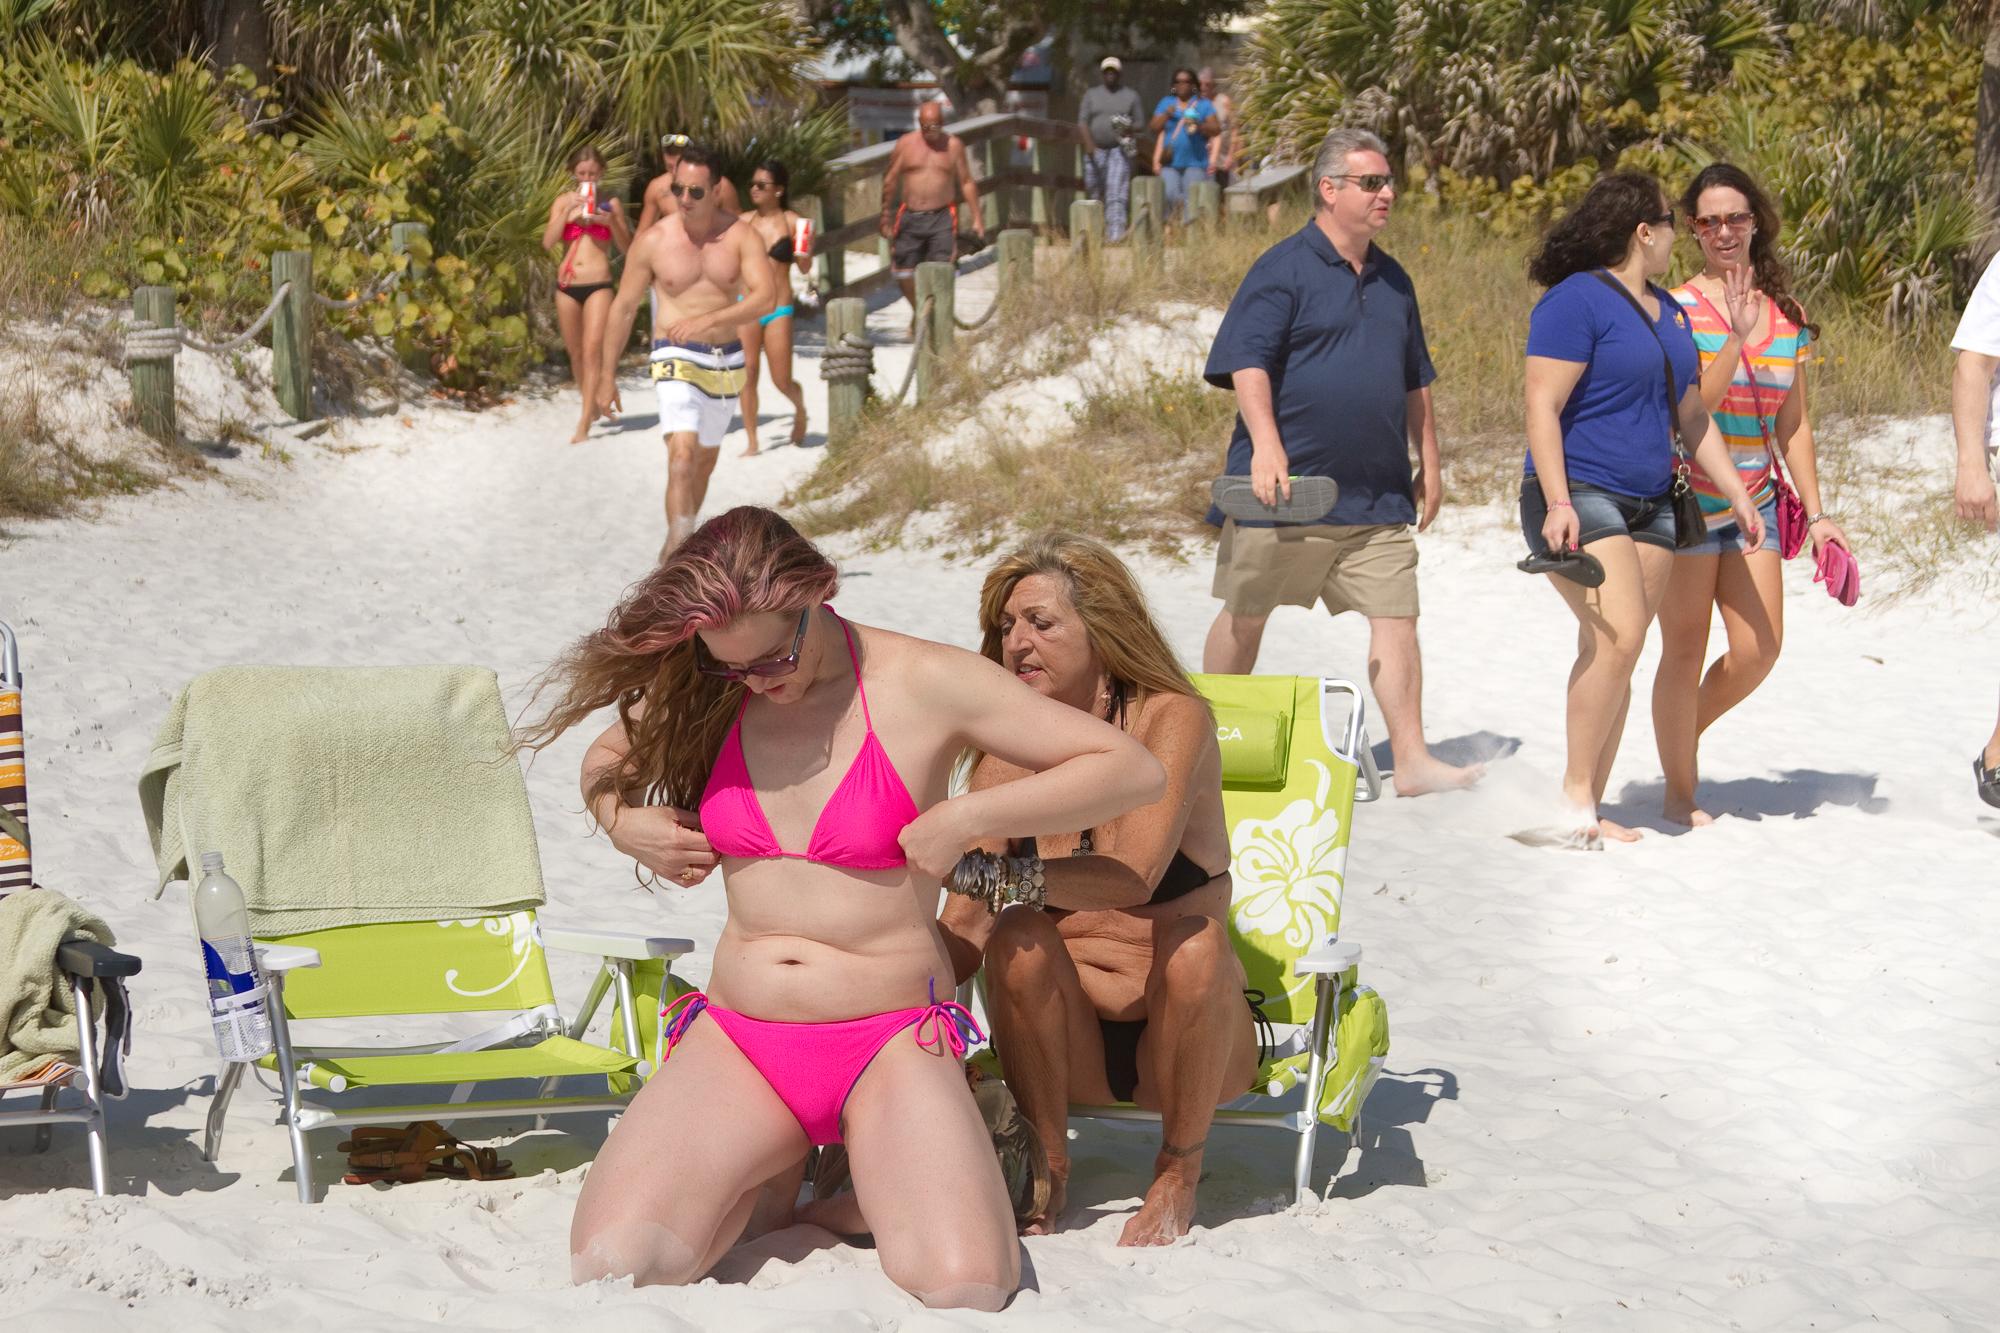 Lorelei, in the Florida sun / 2013